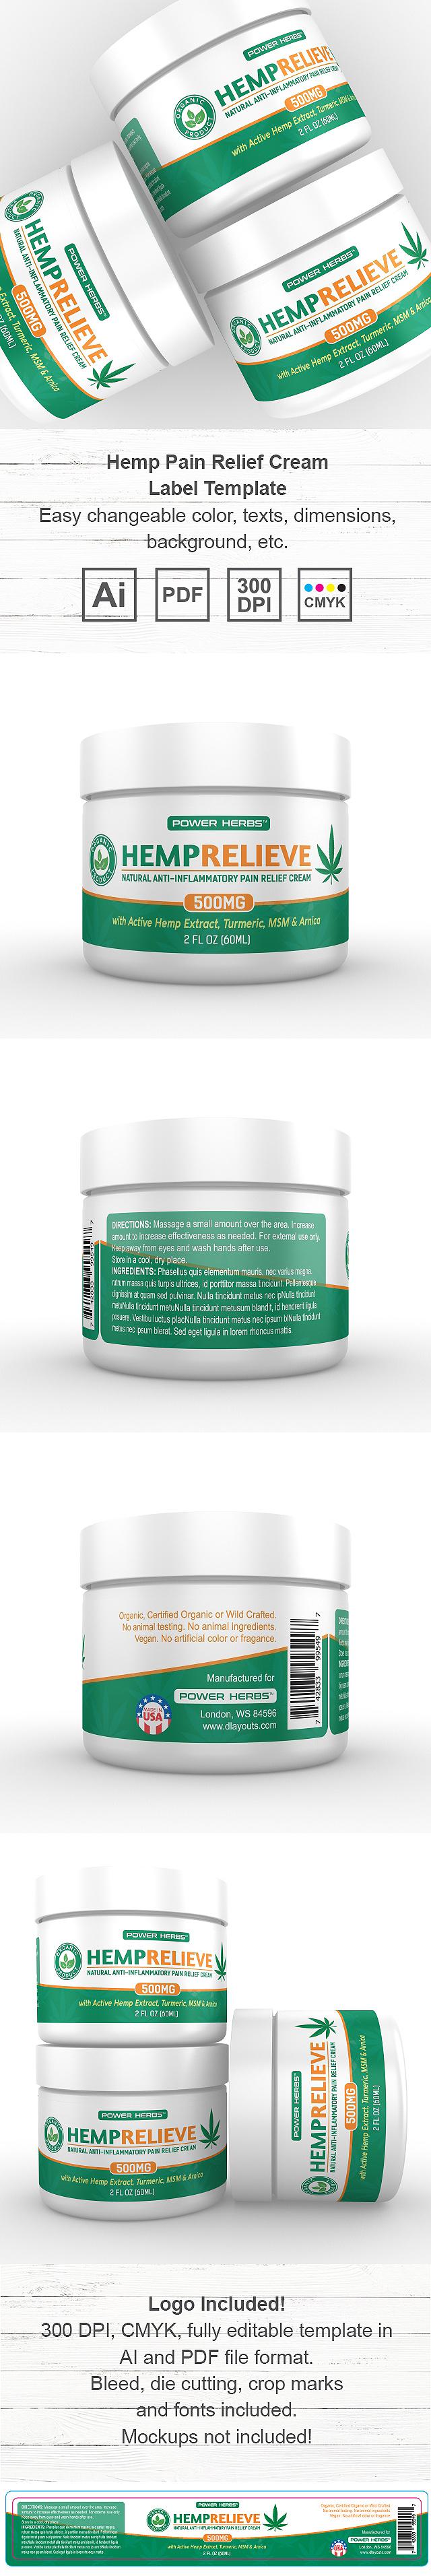 Hemp Pain Relief Cream Label Template